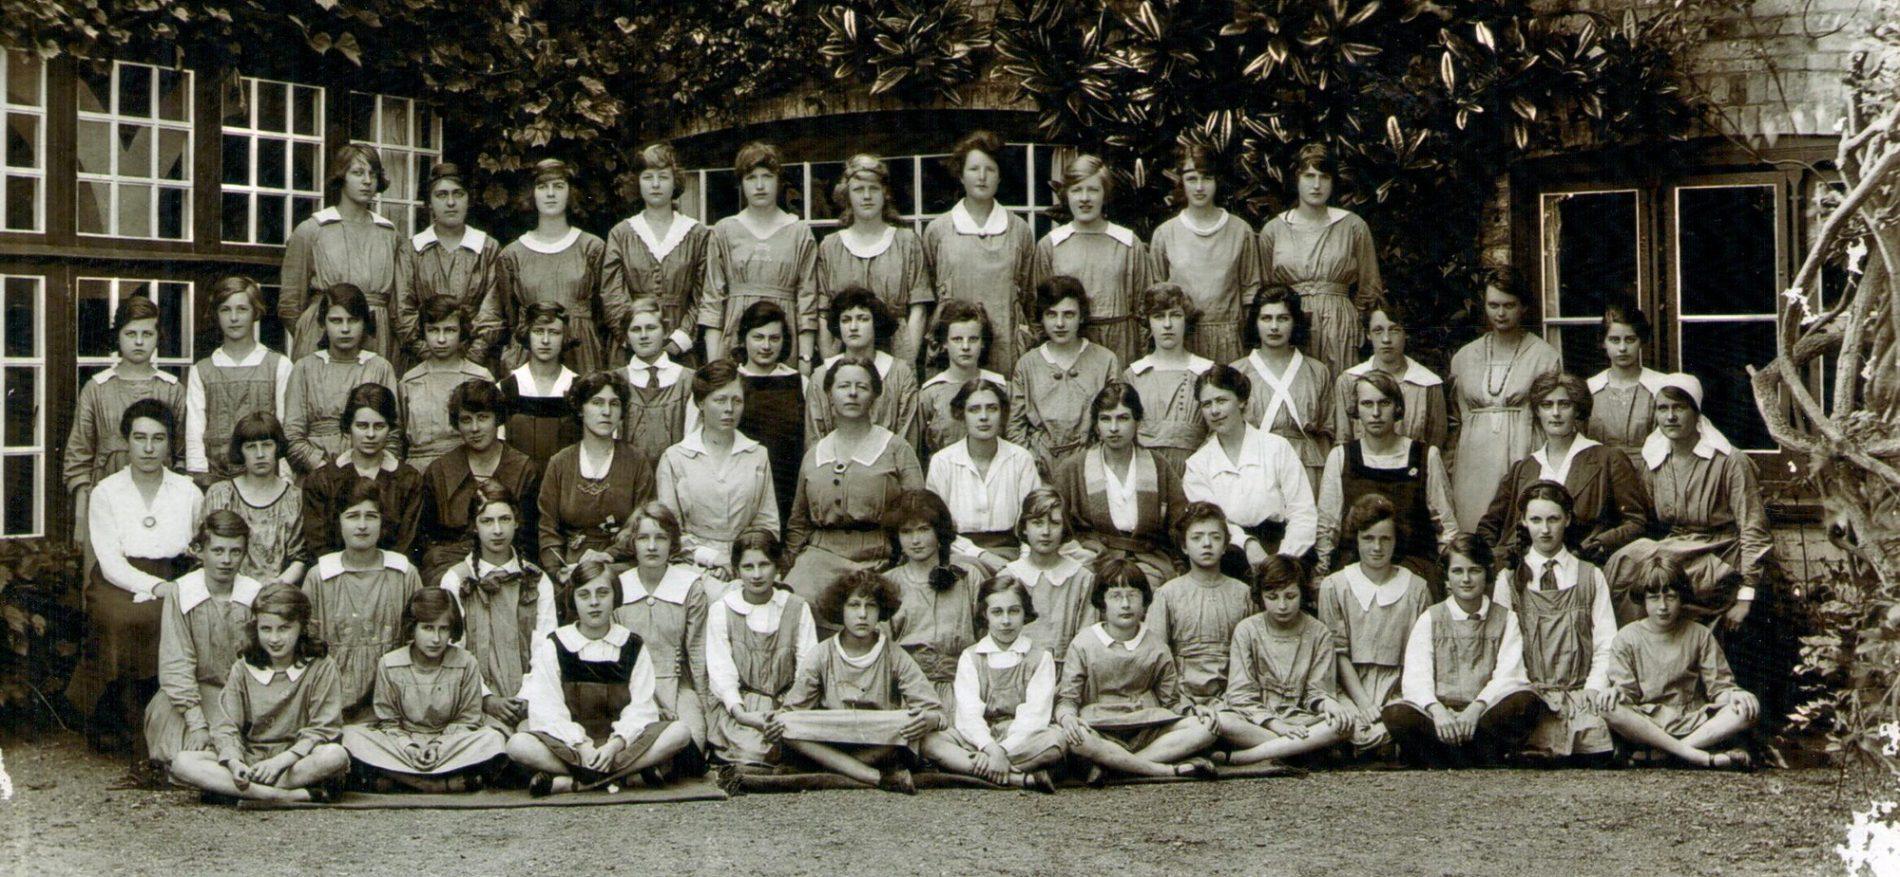 Maltman's Green School Historical Photo